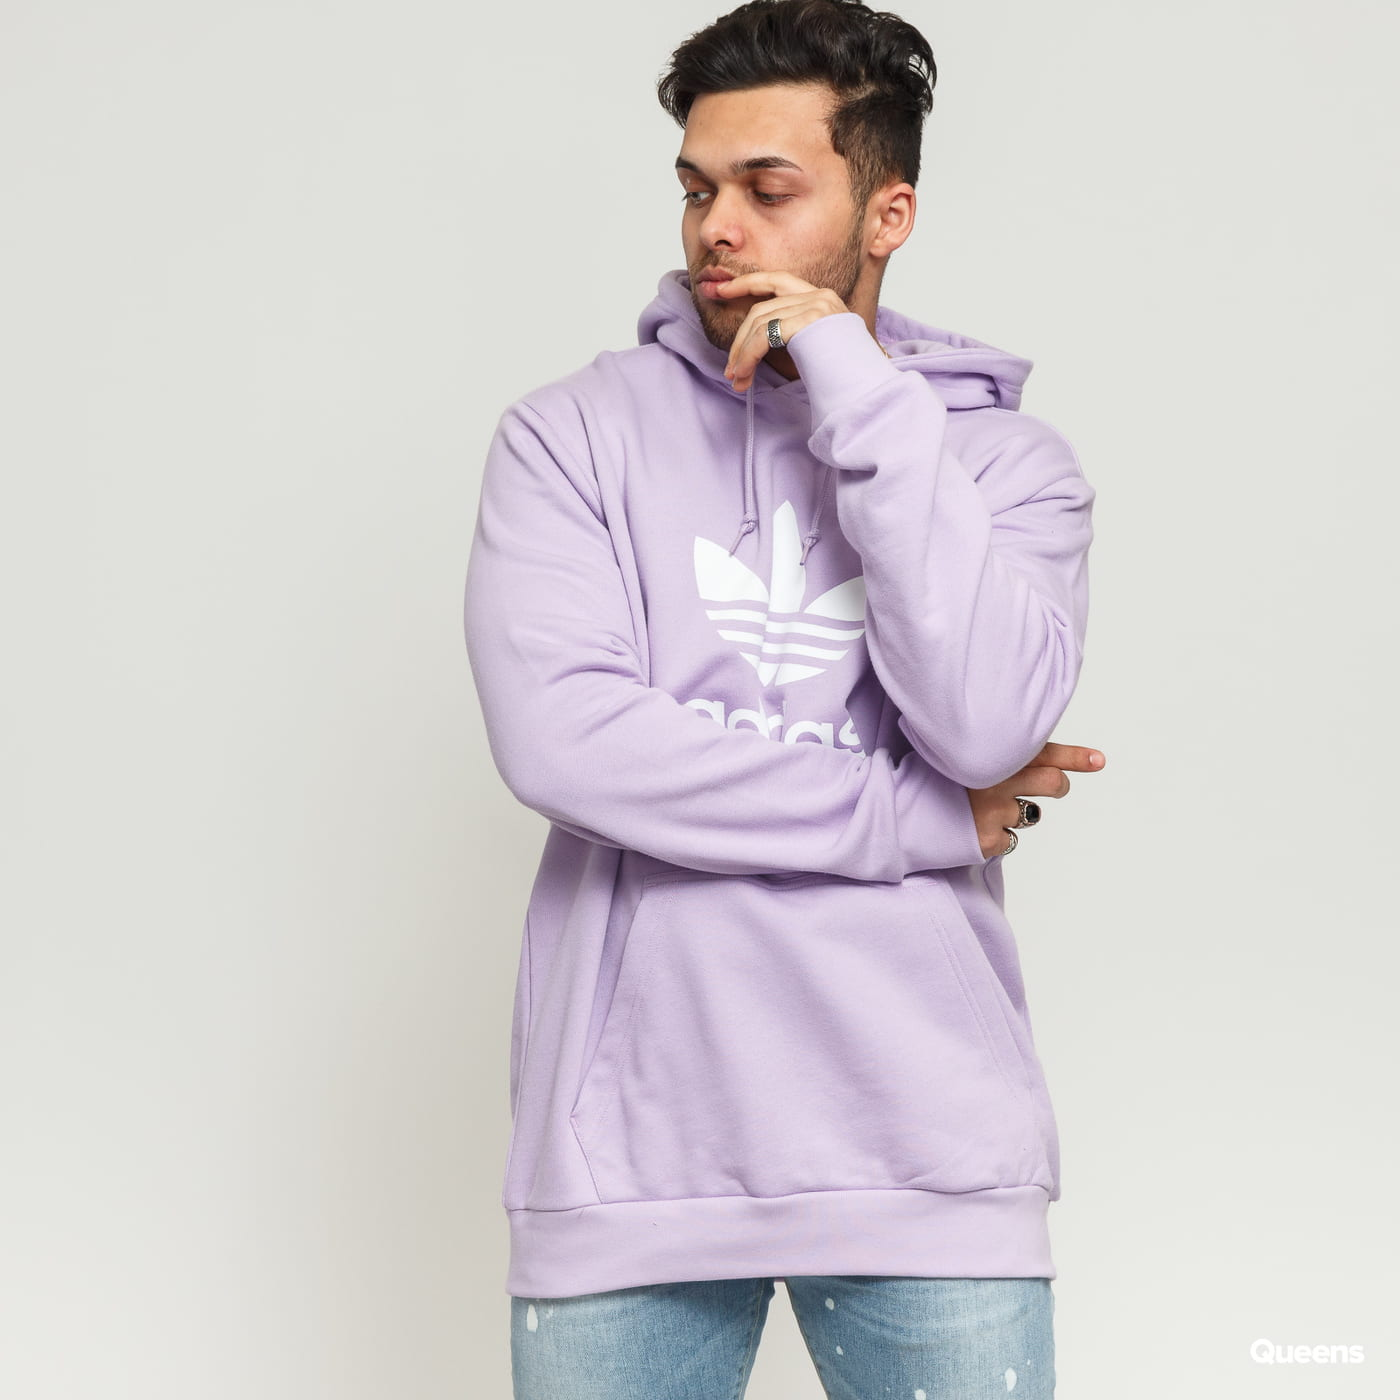 adidas Originals Trefoil Hoodie hell lila